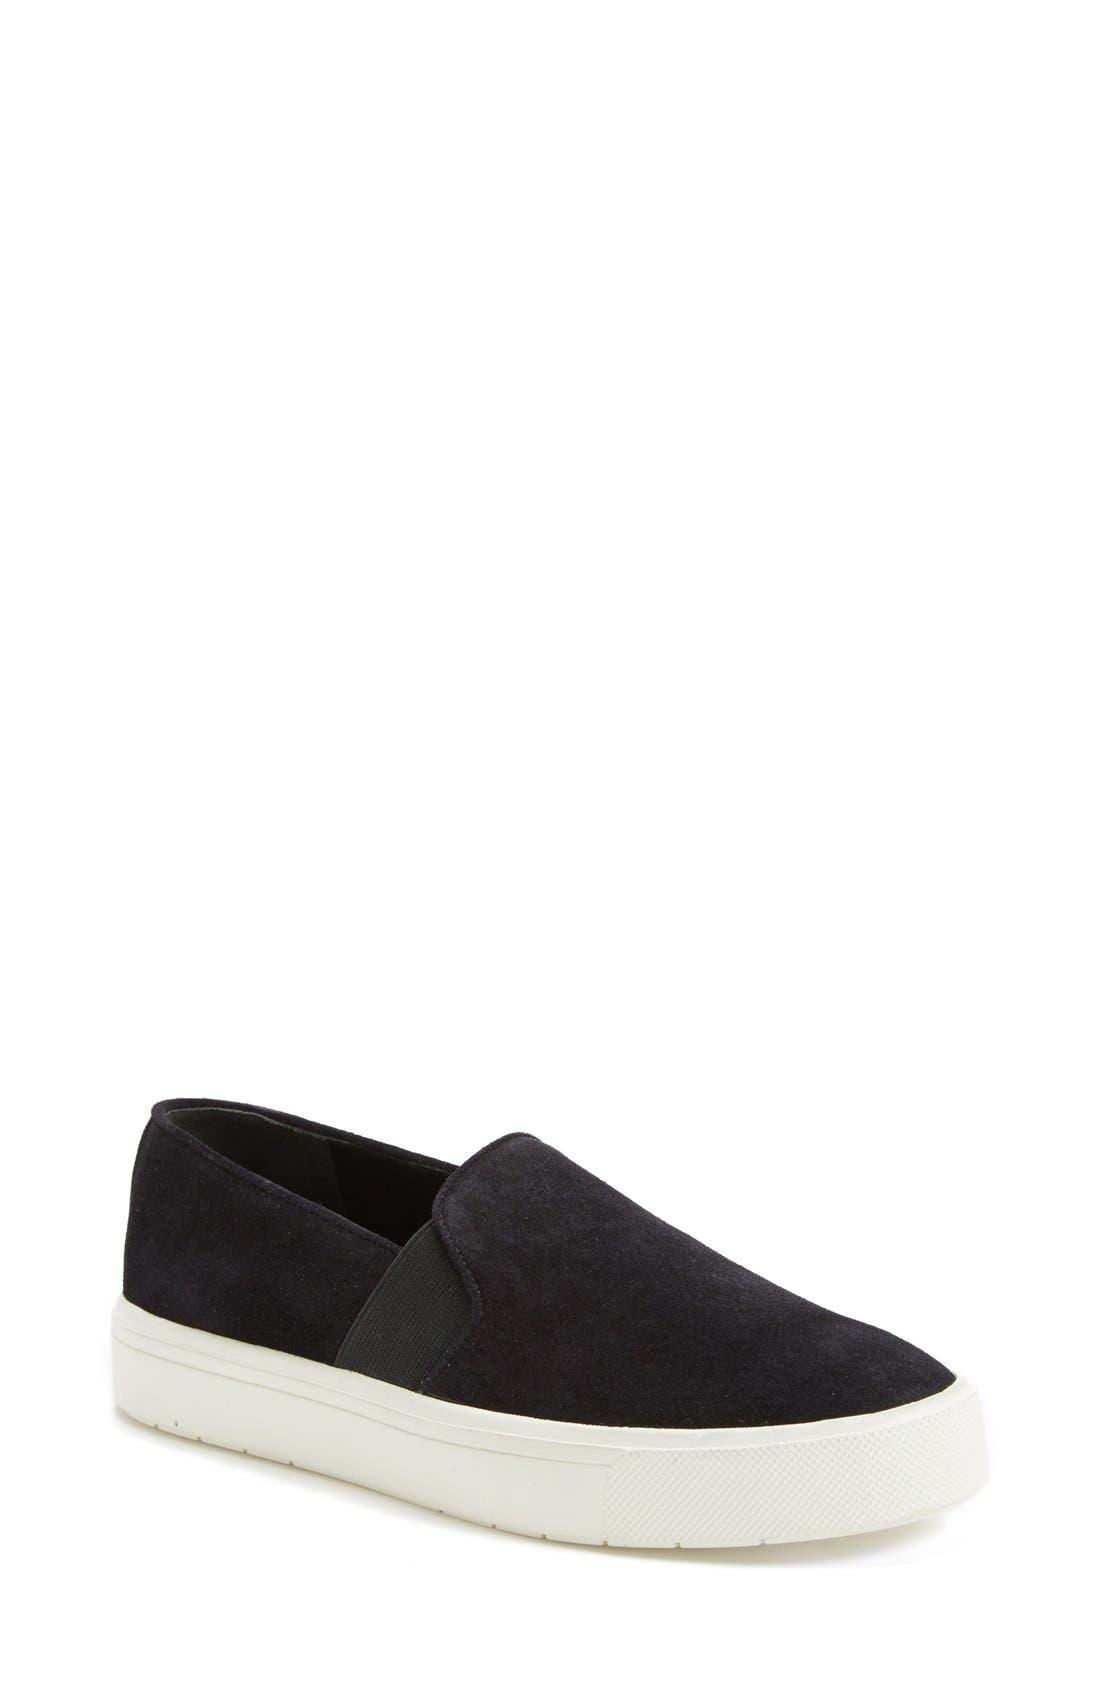 Alternate Image 1 Selected - Vince 'Berlin 6' Slip-On Suede Sneaker (Women)